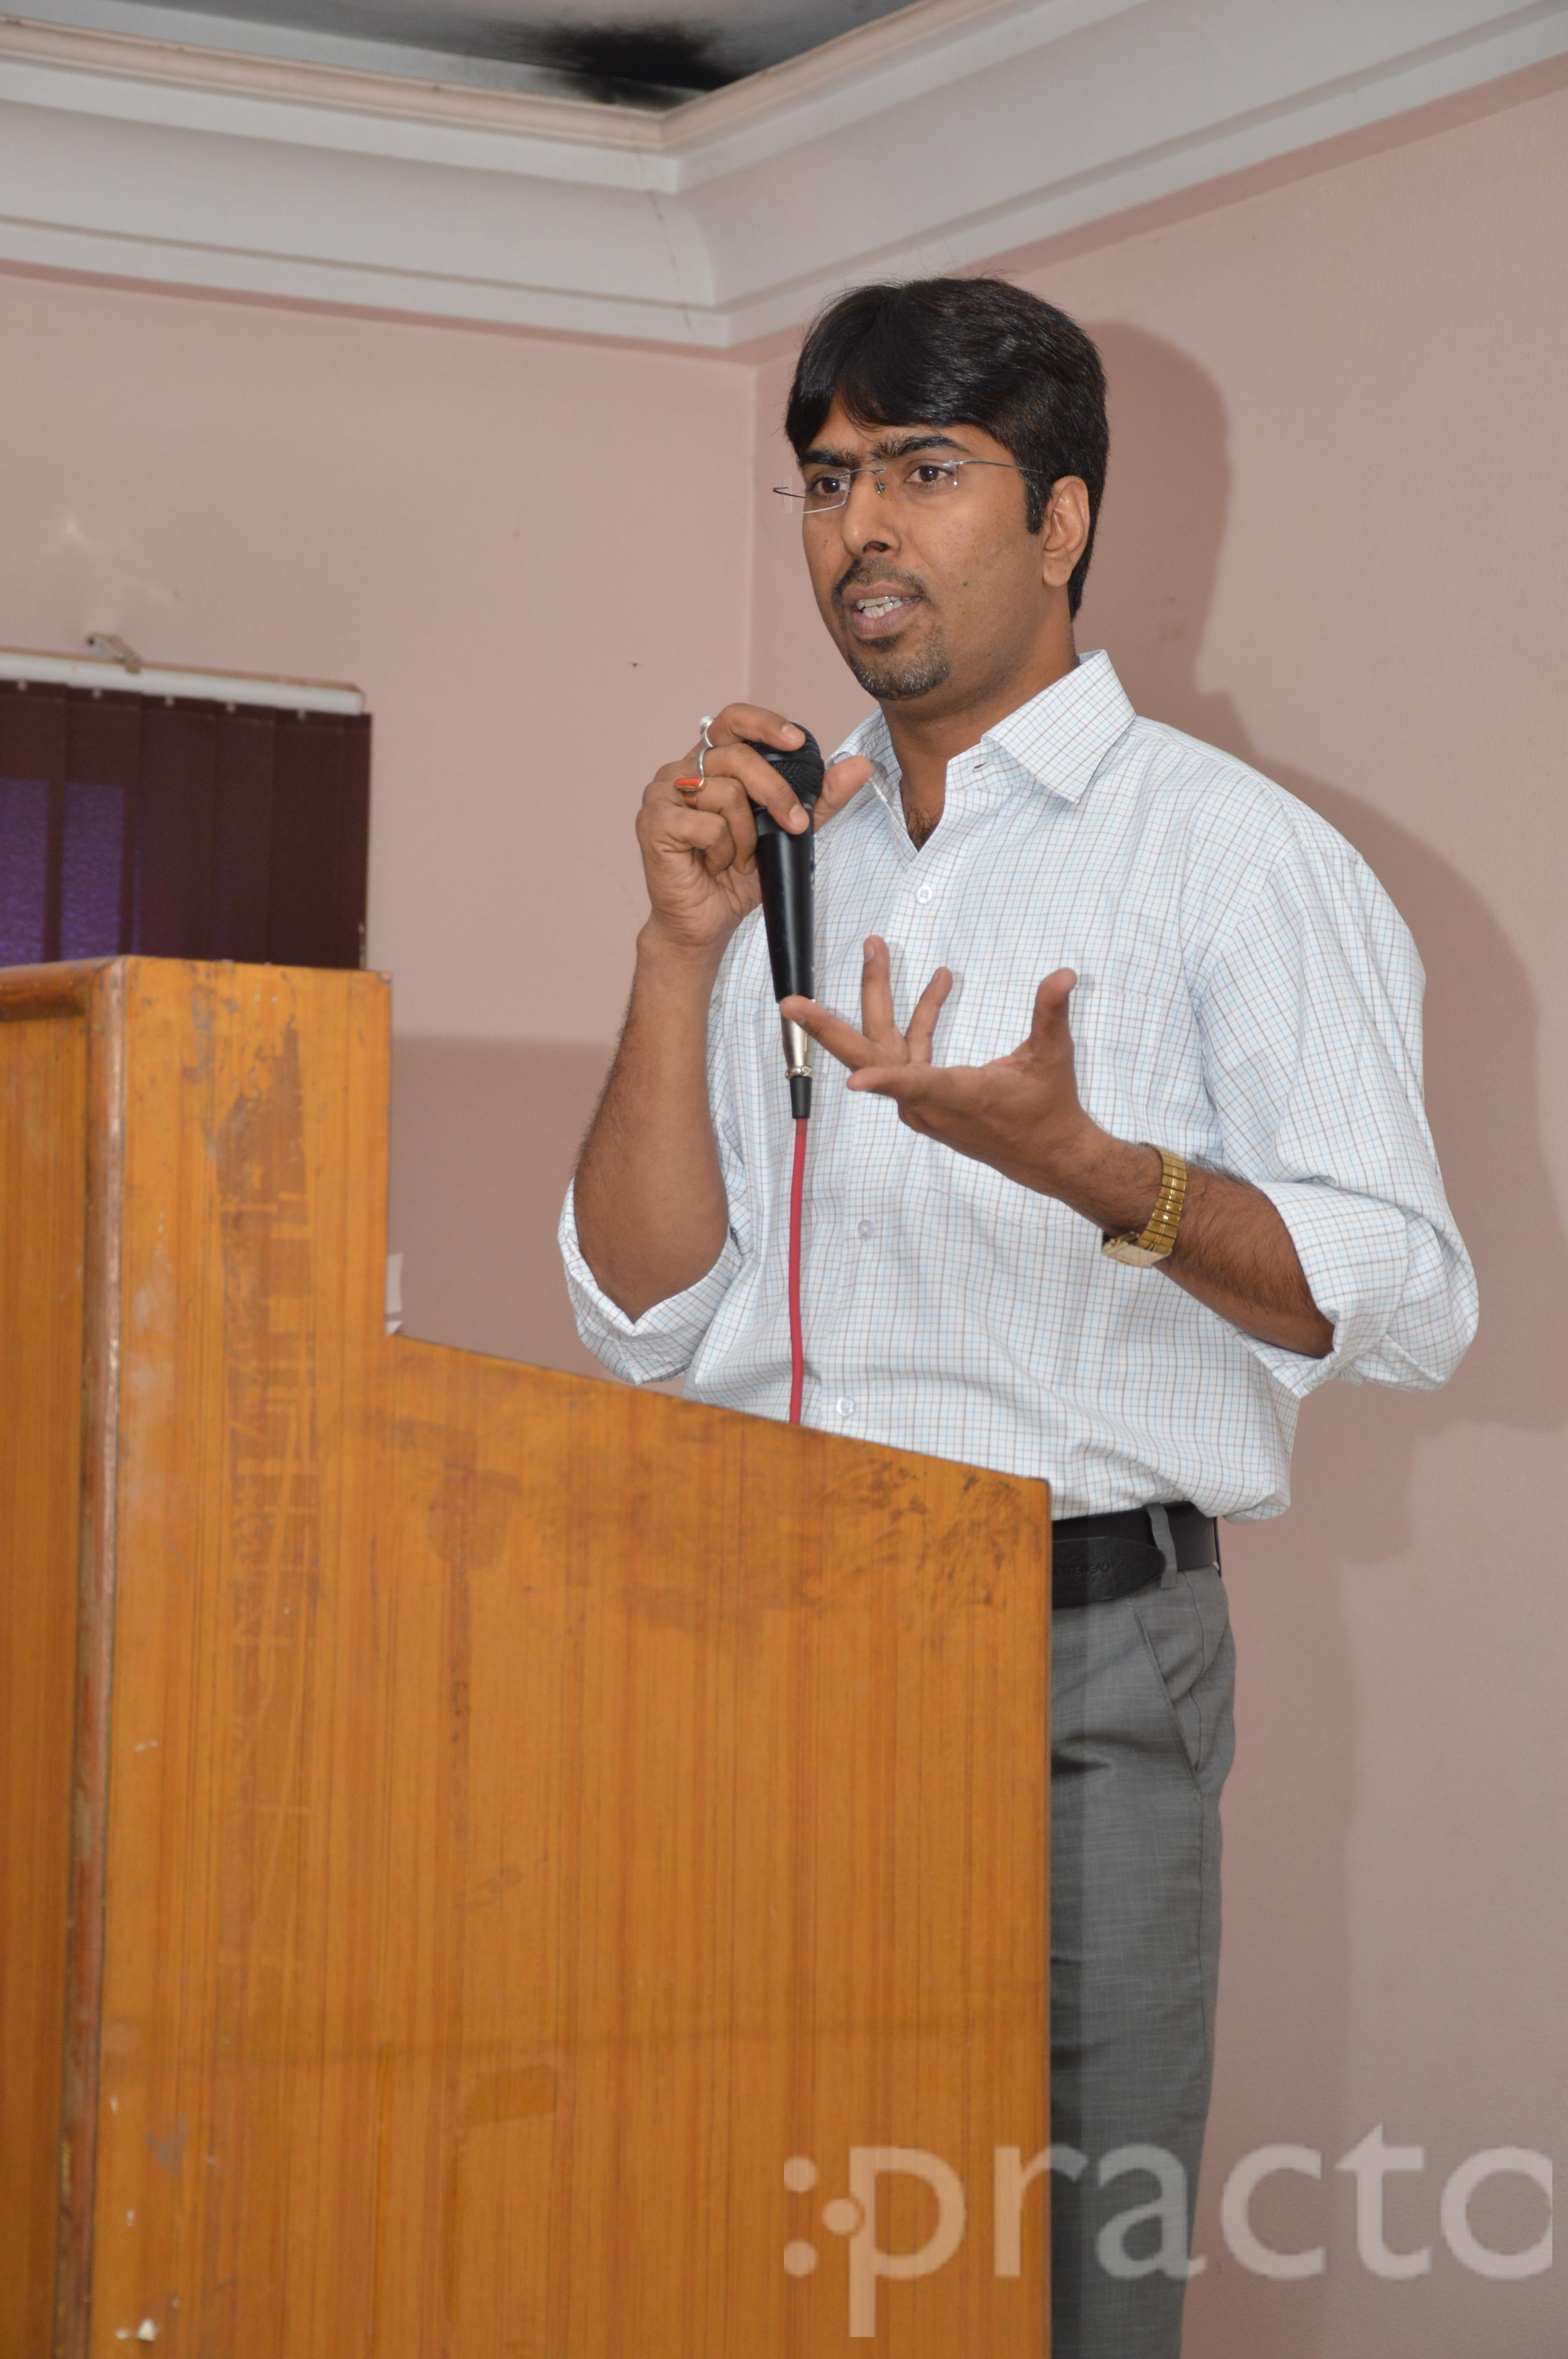 Dr. Santosh Kumar - Occupational Therapist